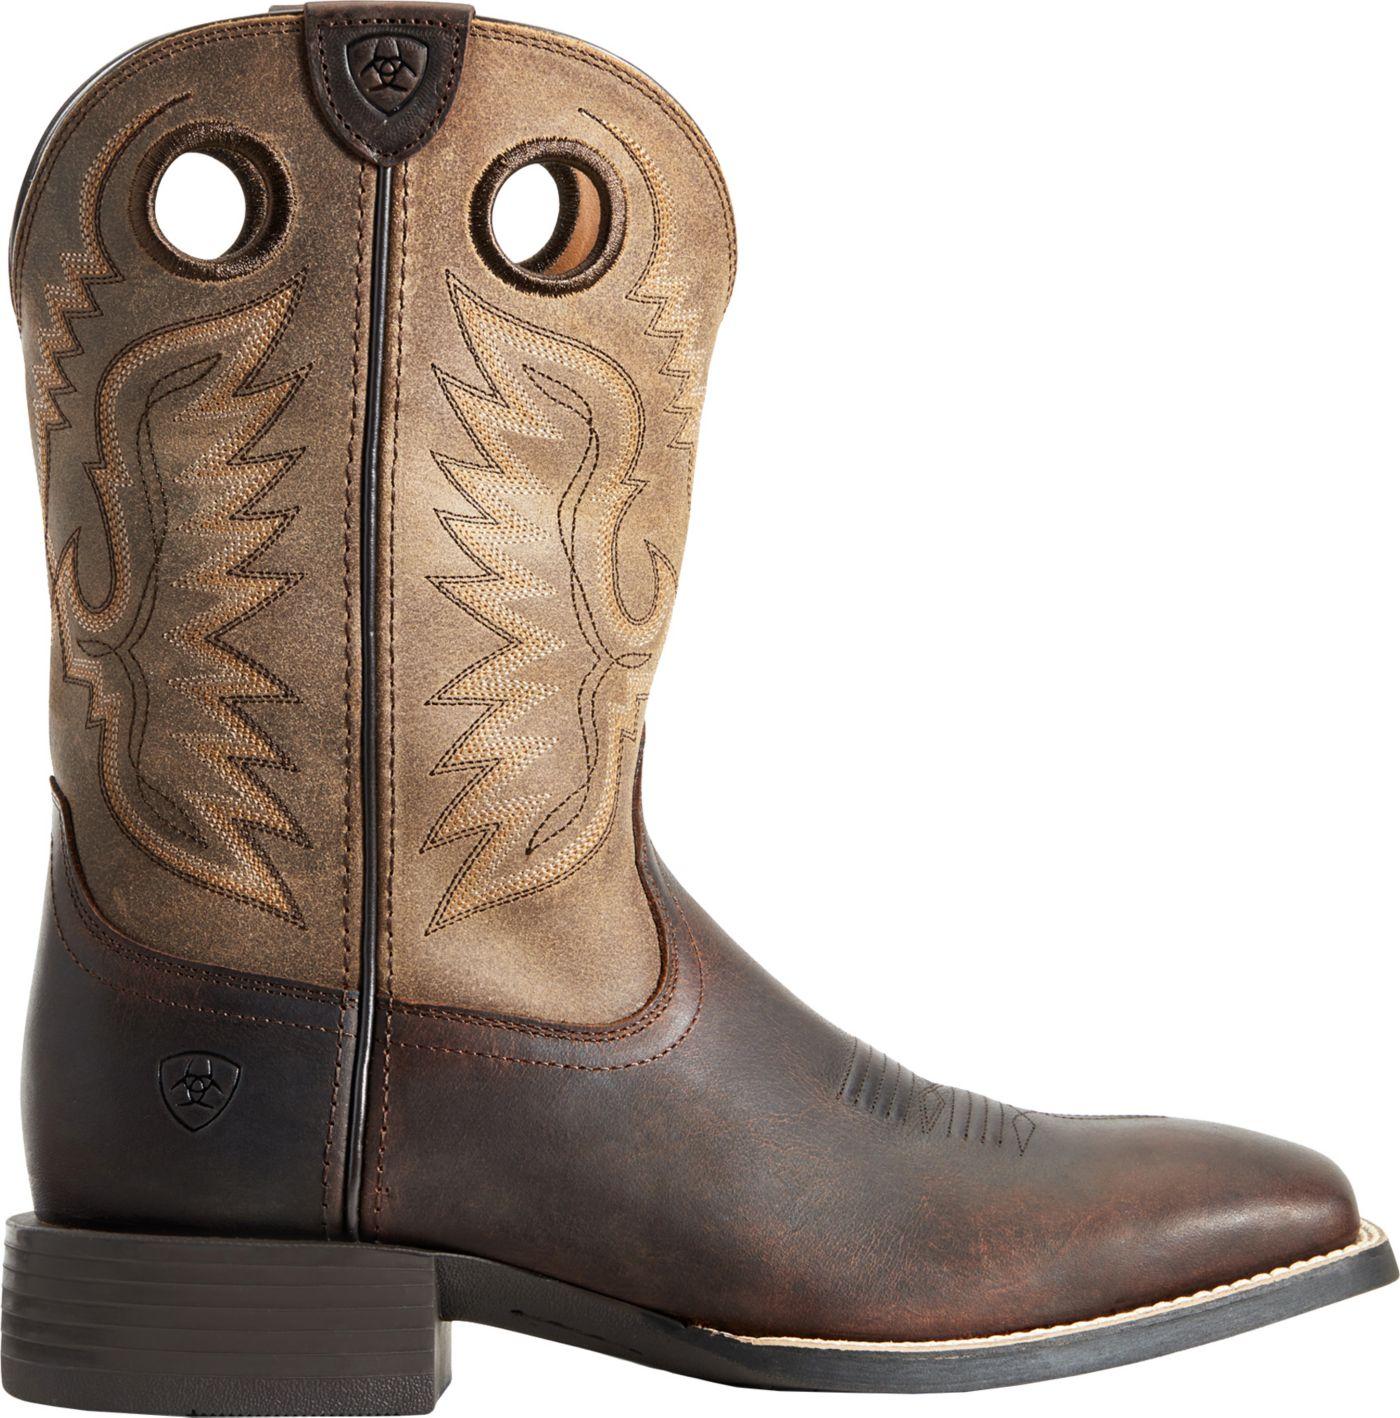 Ariat Men's Sport Ranger Western Boots